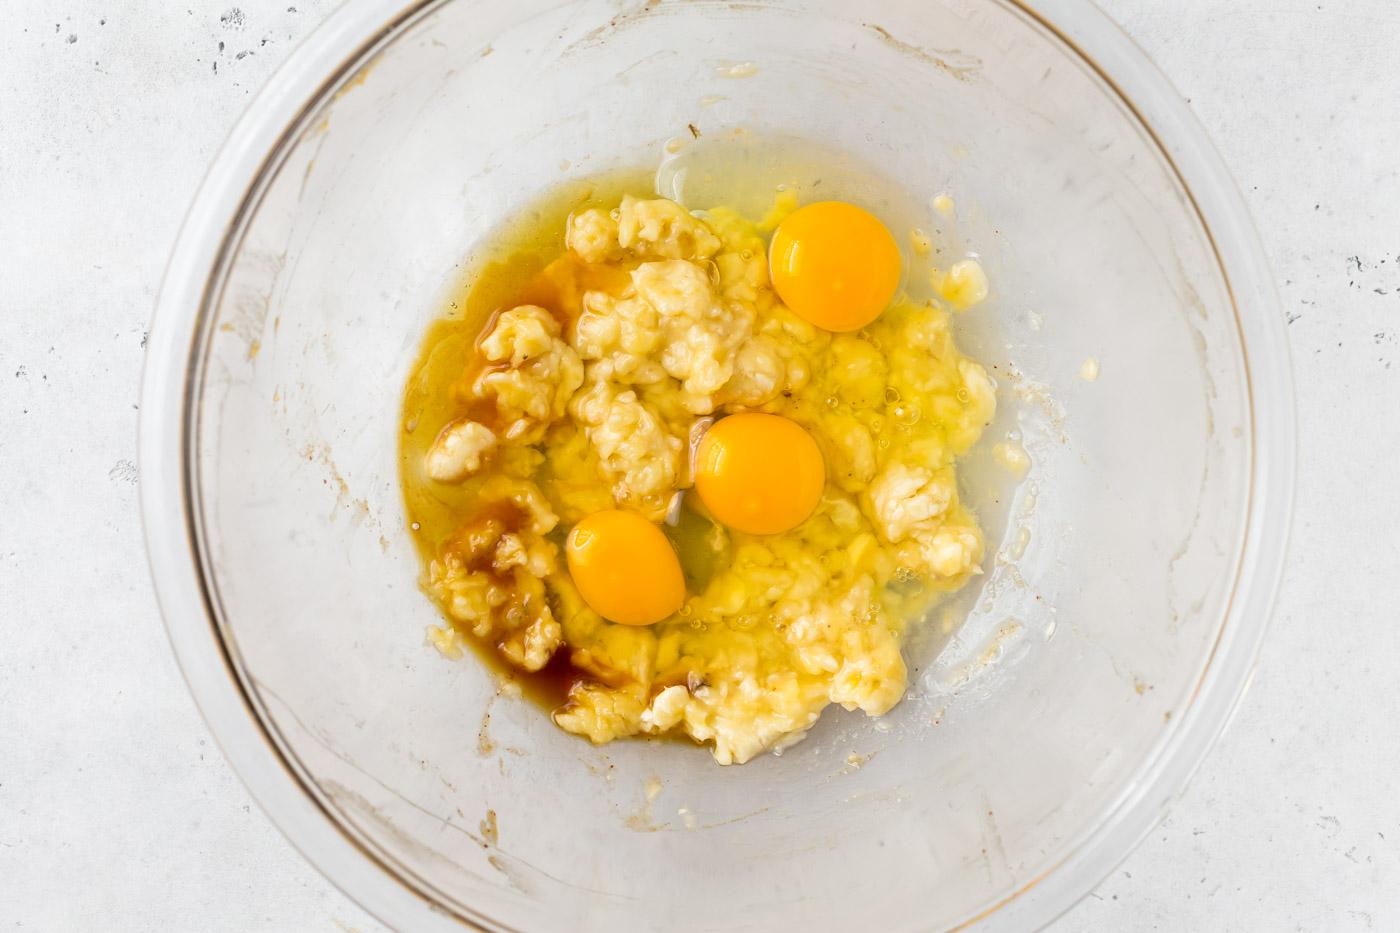 Smashed banana, whole eggs, honey, and vanilla in glass mixing bowl